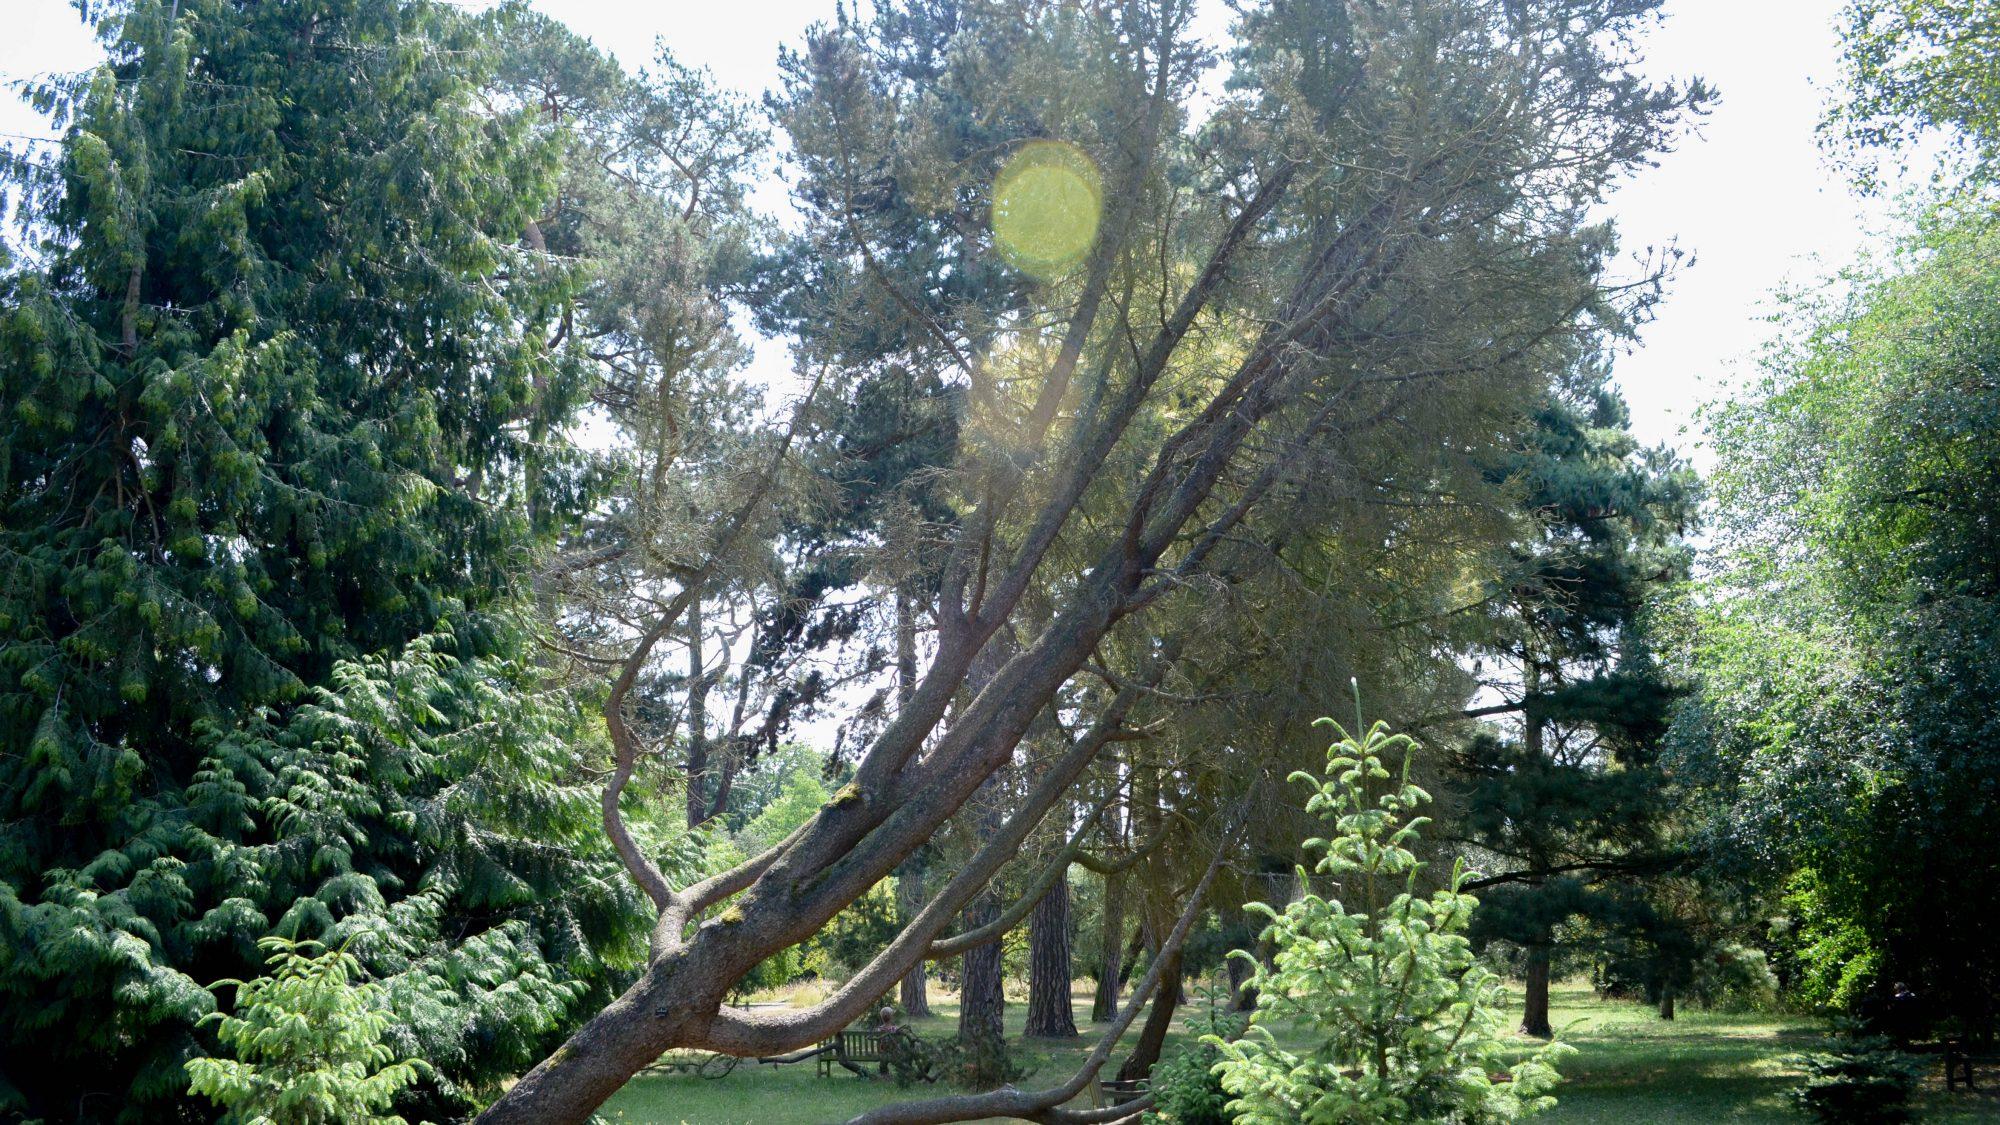 Pinus monophylla (single-needled pine), in the old pinetum.